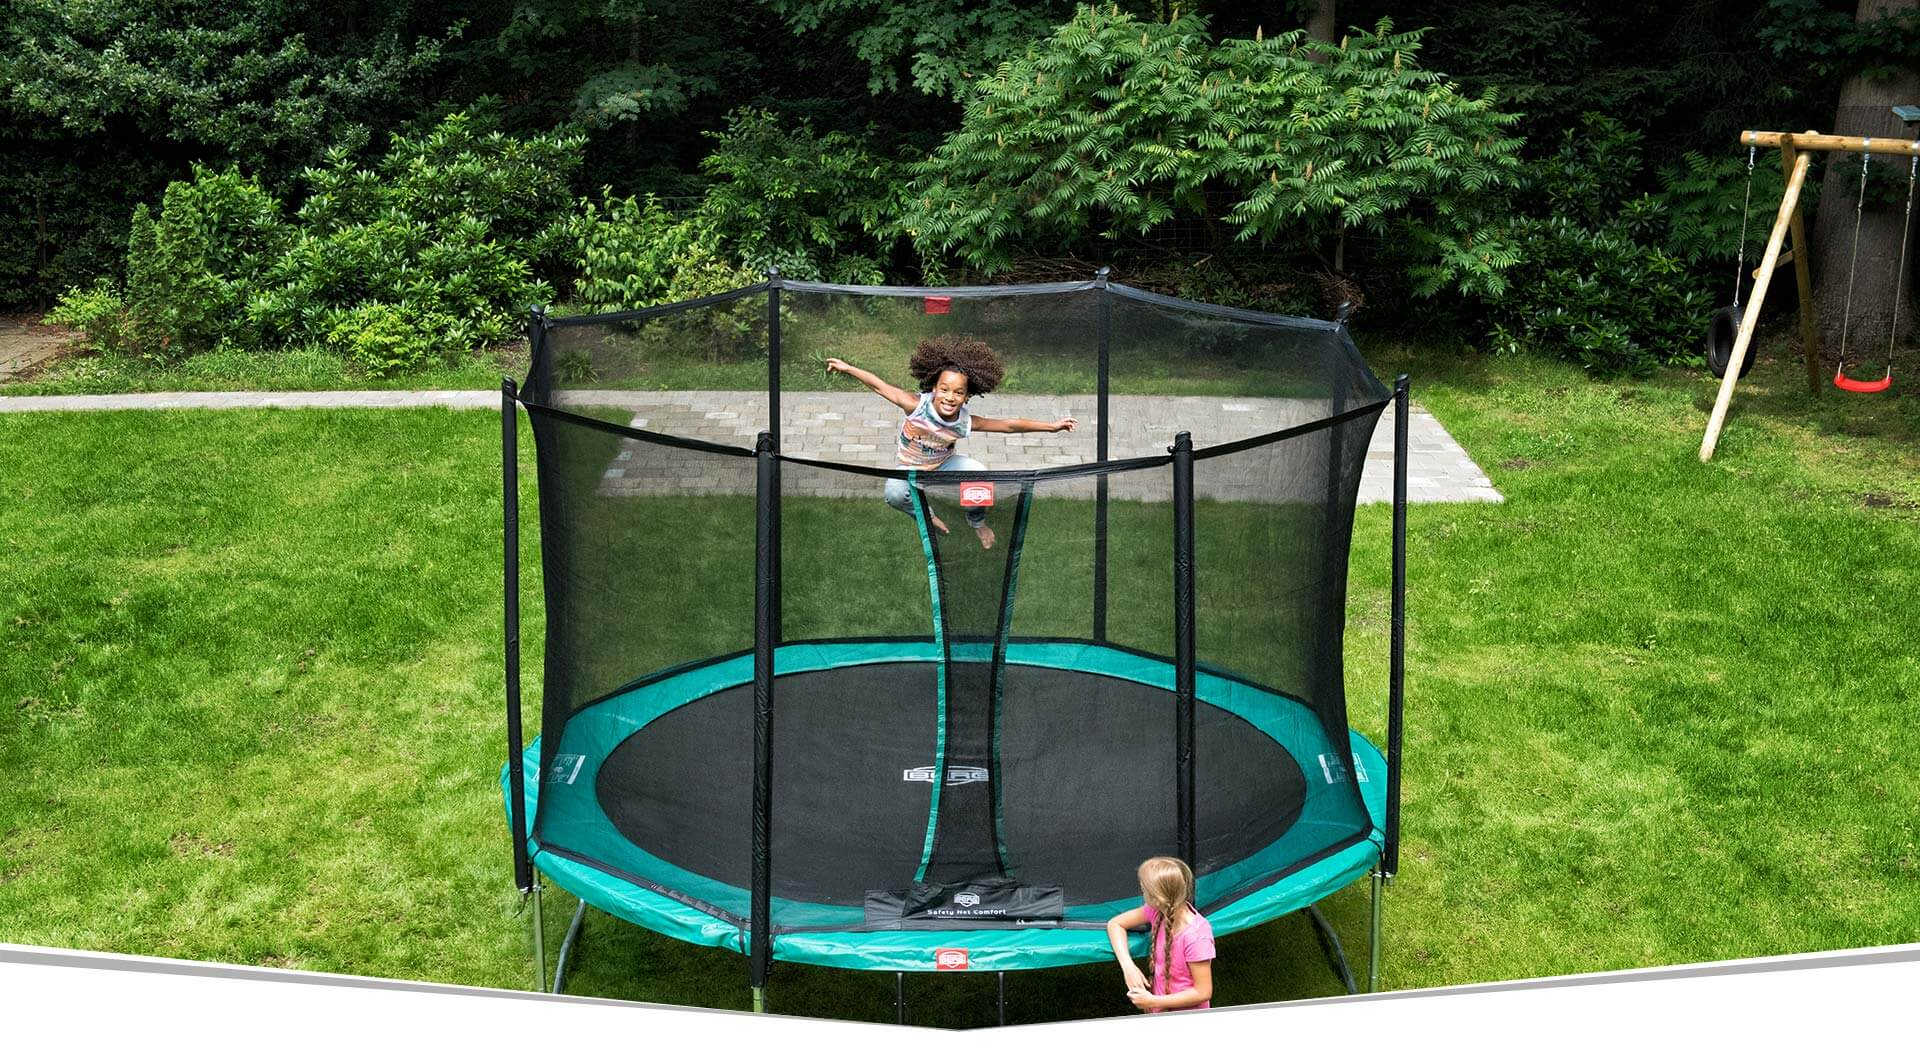 SALTA Premium Black Edition Trampolin Test - trampolin-profi.de - Vergleich BERG Favorit Trampolin